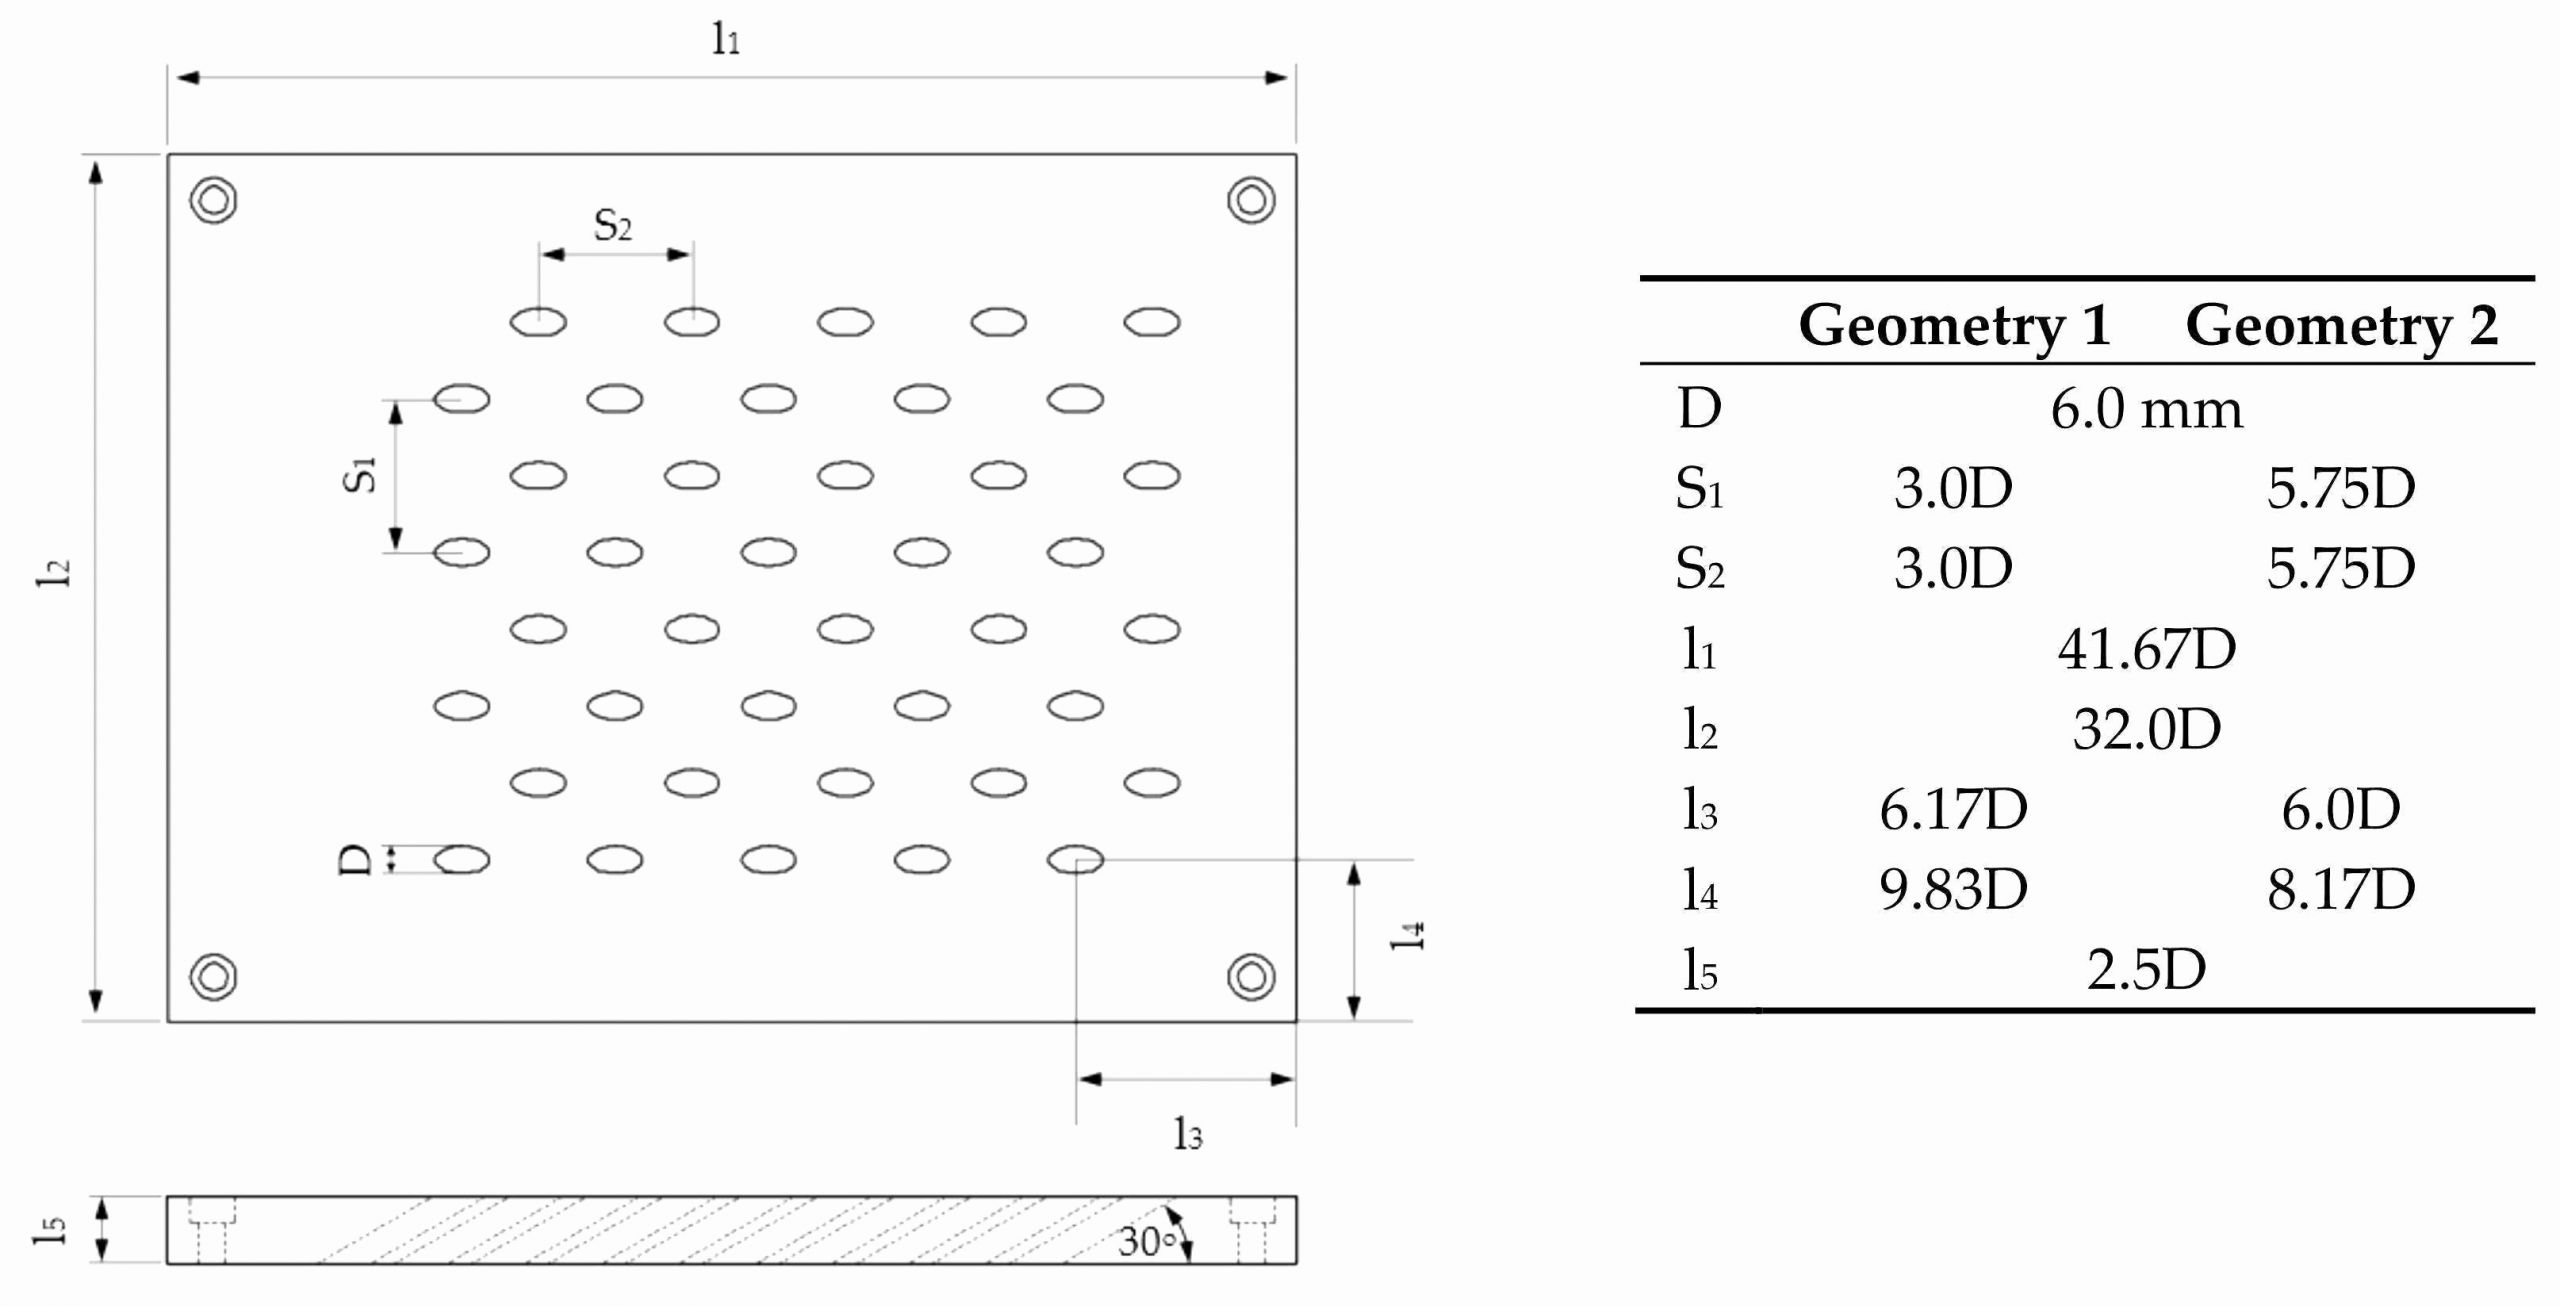 calcul structure terrasse bois unique calcul plancher bois of calcul structure terrasse bois